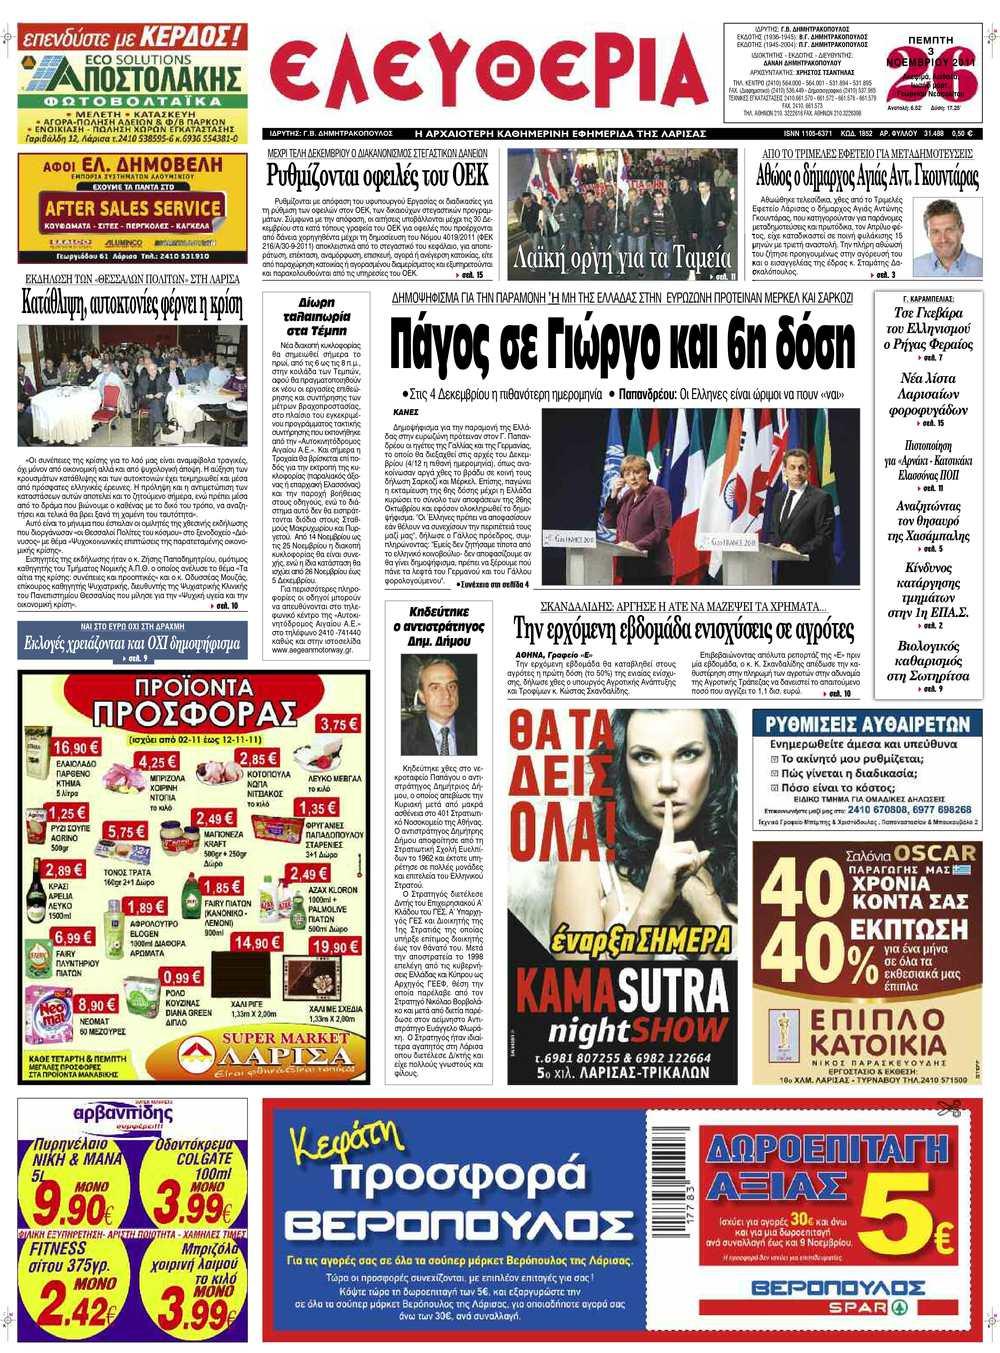 7ebbd685f8 Calaméo - Eleftheria.gr 03 11 2011